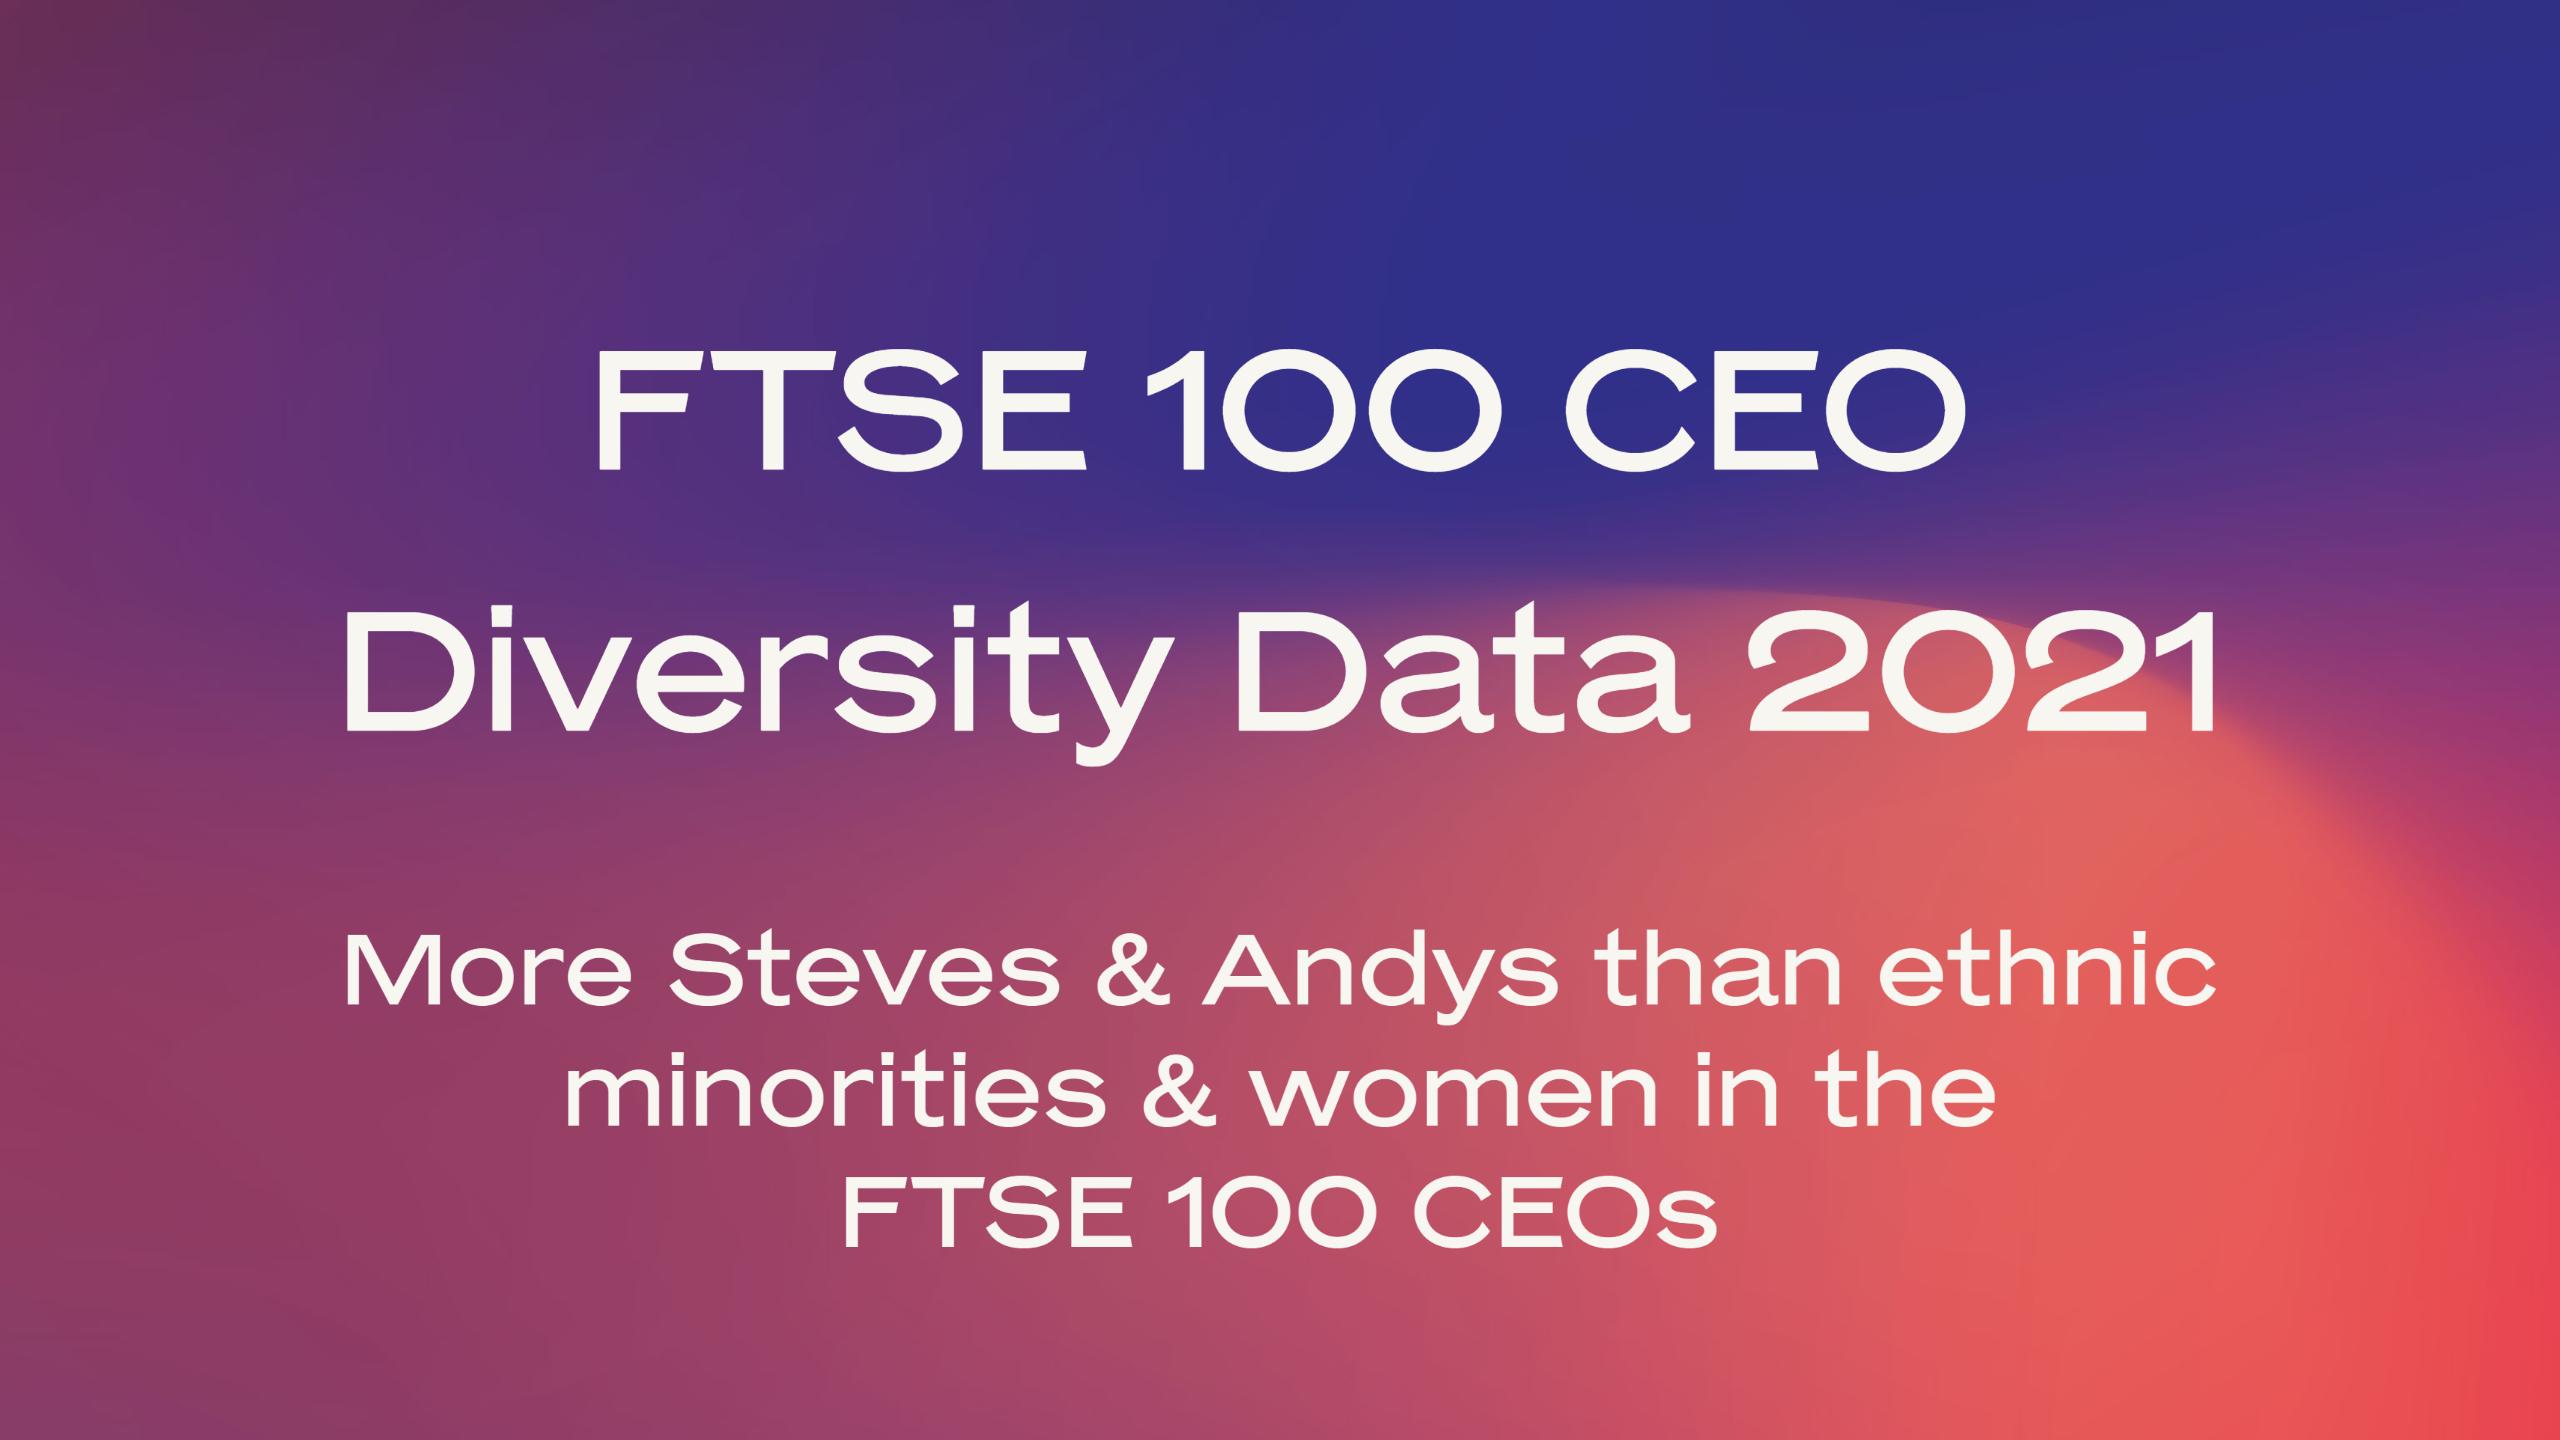 FTSE 100 CEO Diversity Data 2021